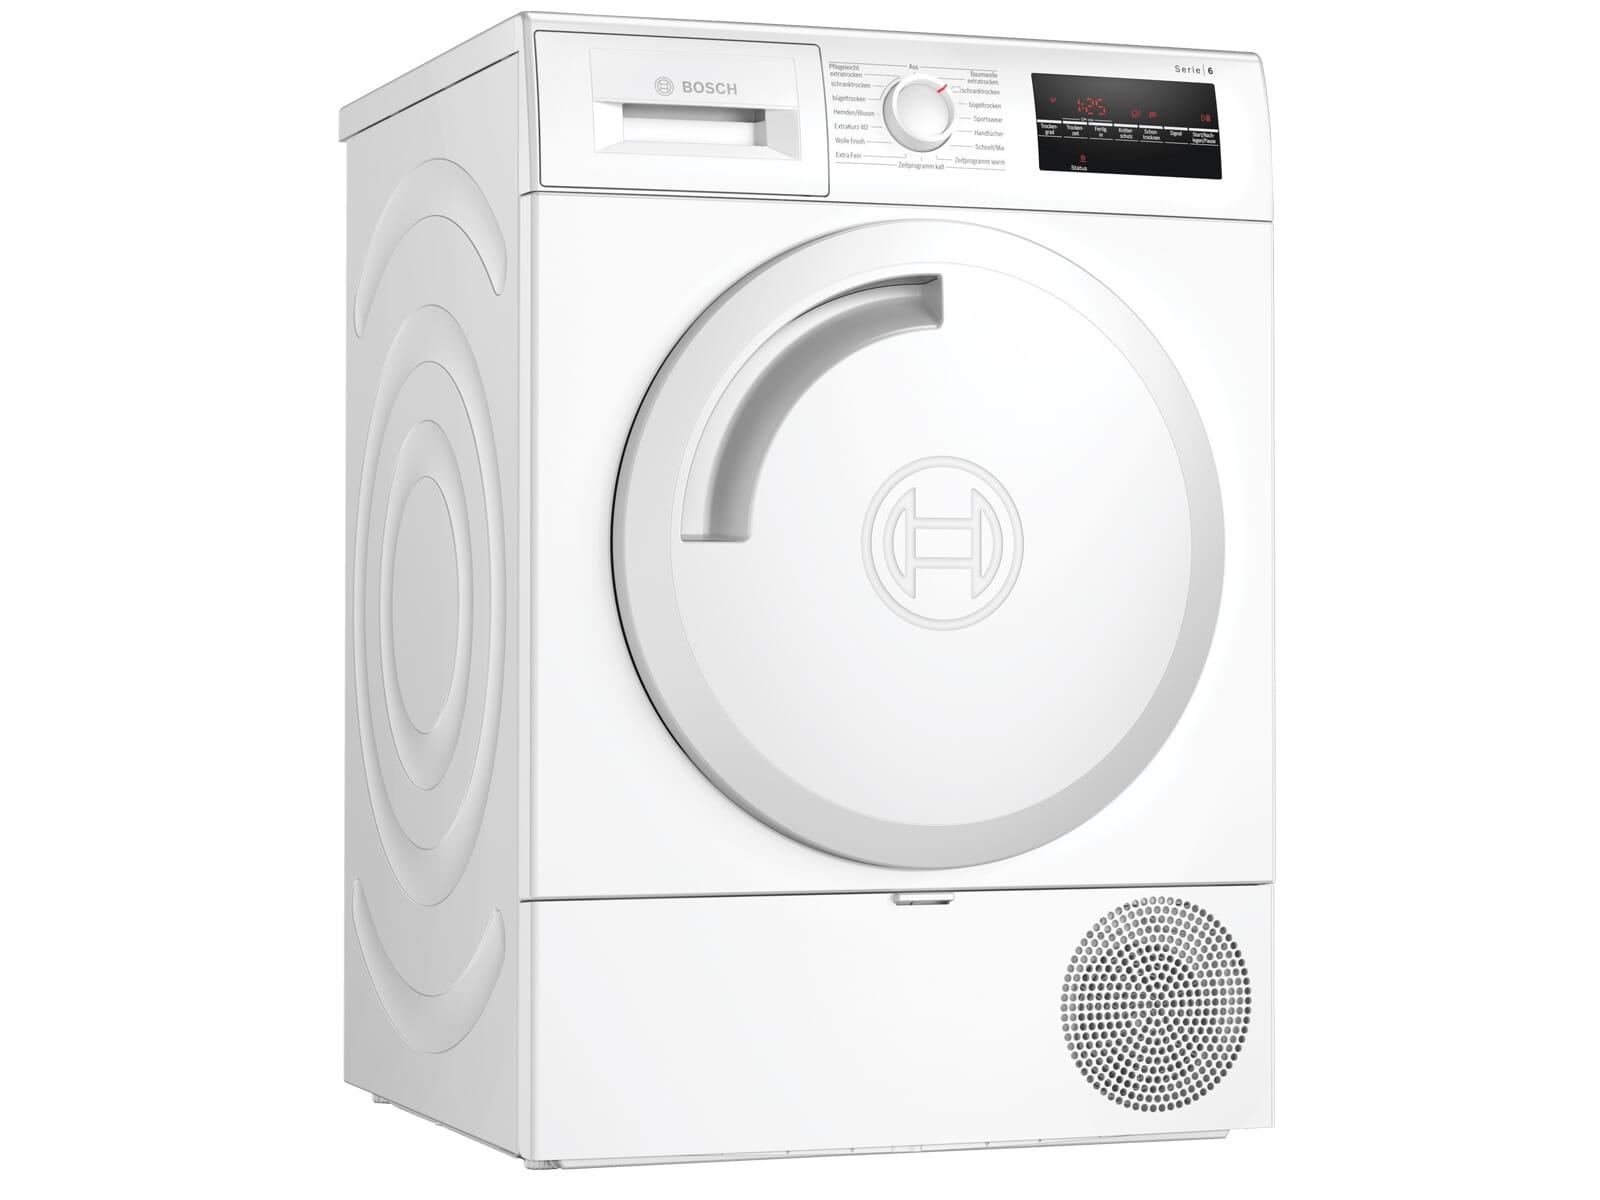 Bosch WTR854A0 Trockner Weiß